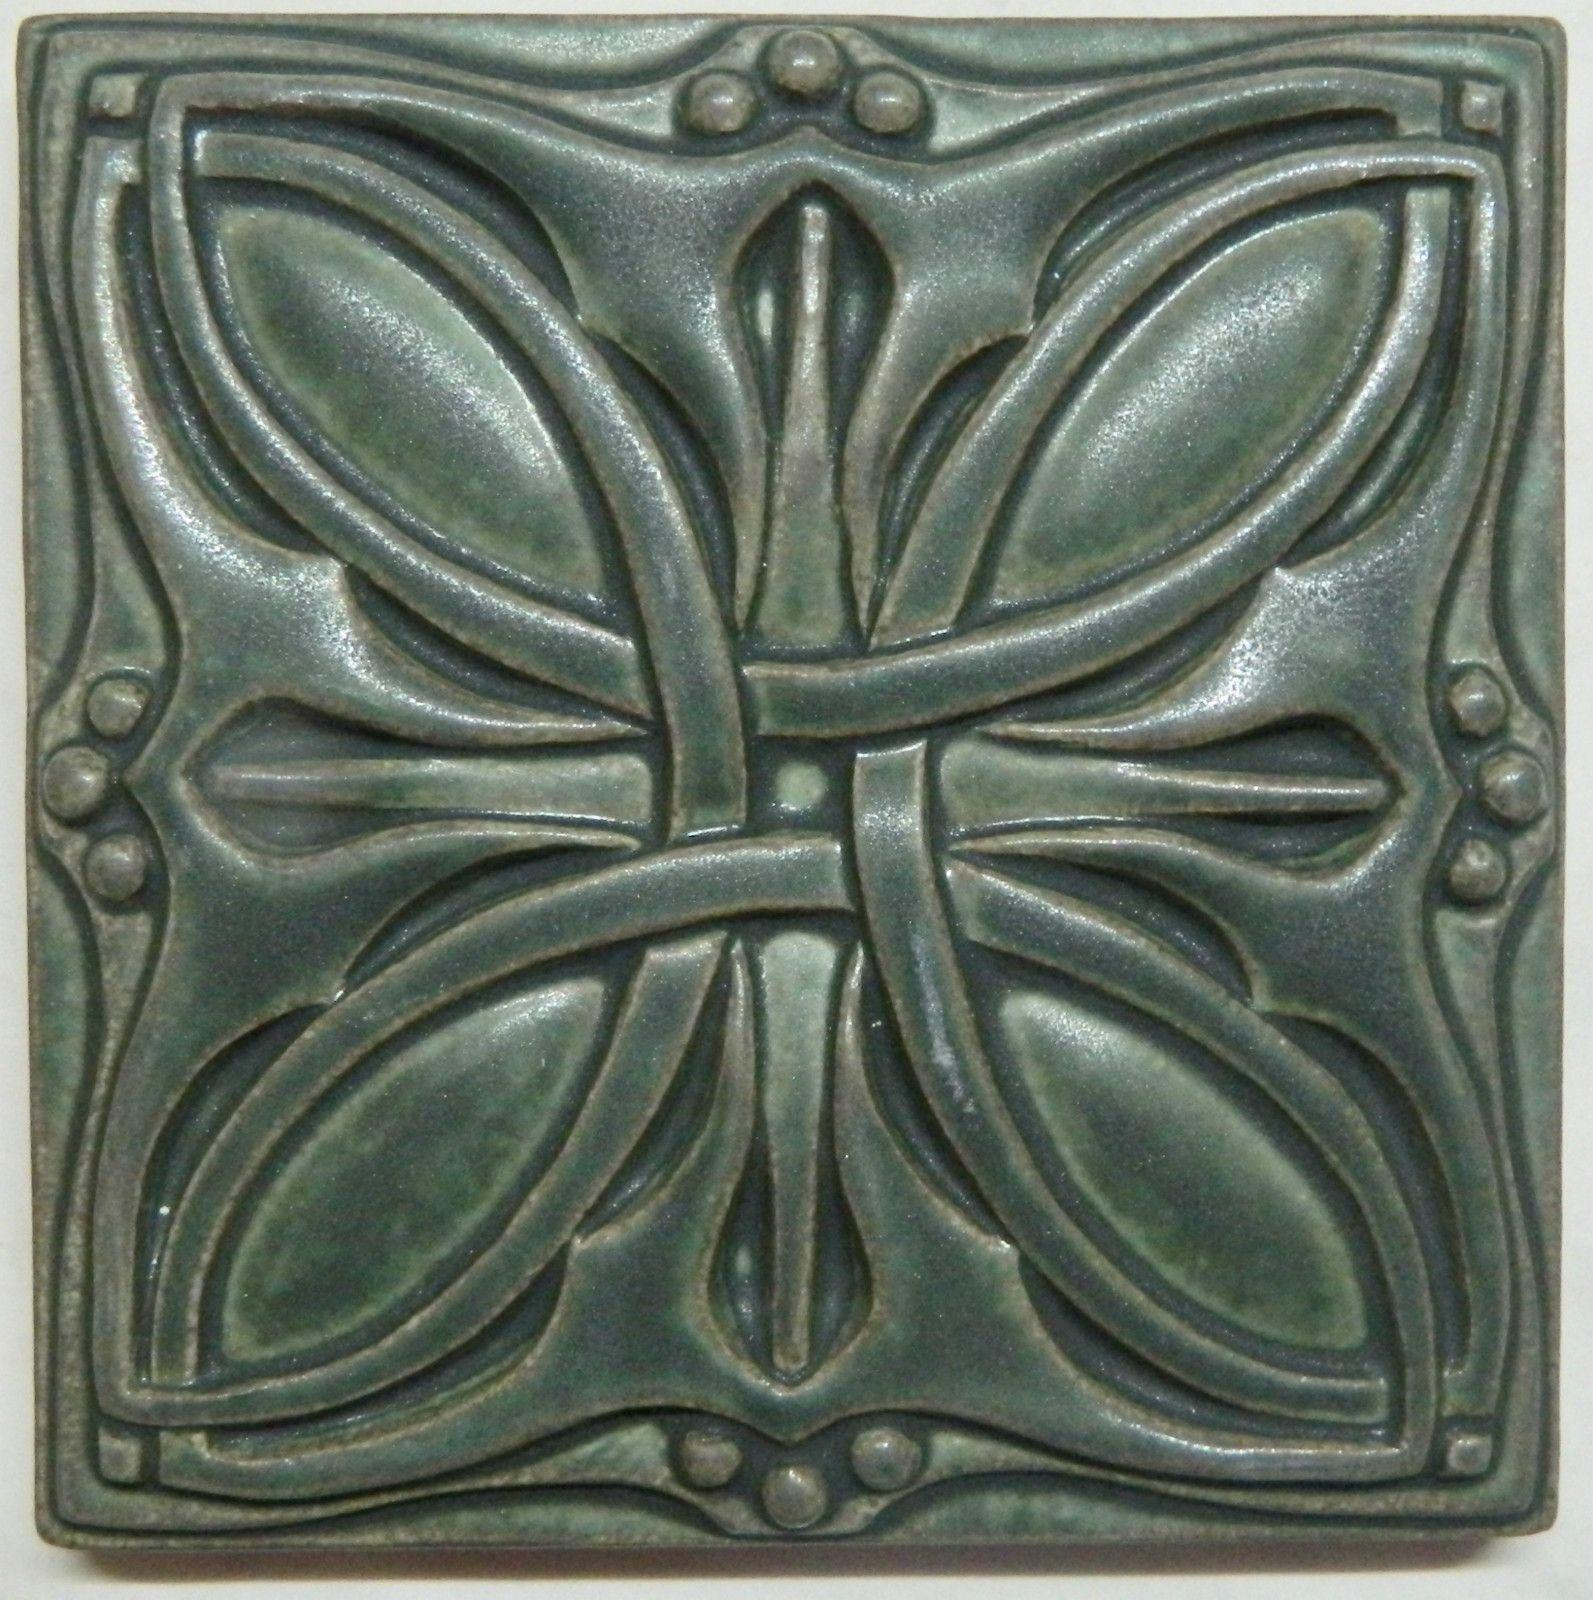 Arts and crafts tiles - Motawi Art Tile Cicero 6 X 6 Louis Sullivan Arts And Crafts Pottery Ceramics